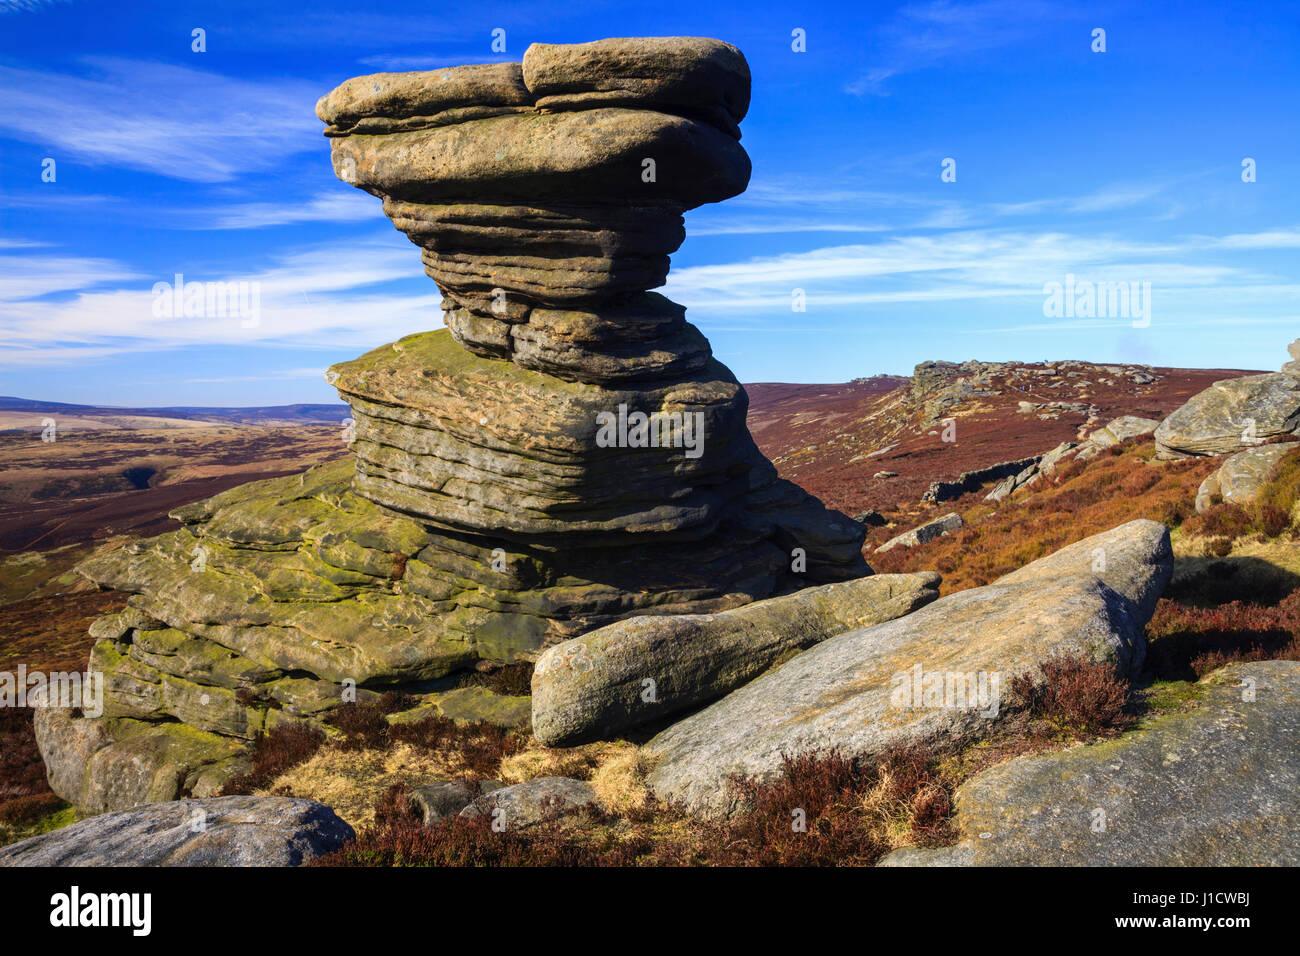 The Salt Cellar on Derwent Edge in the Peak District National Park - Stock Image